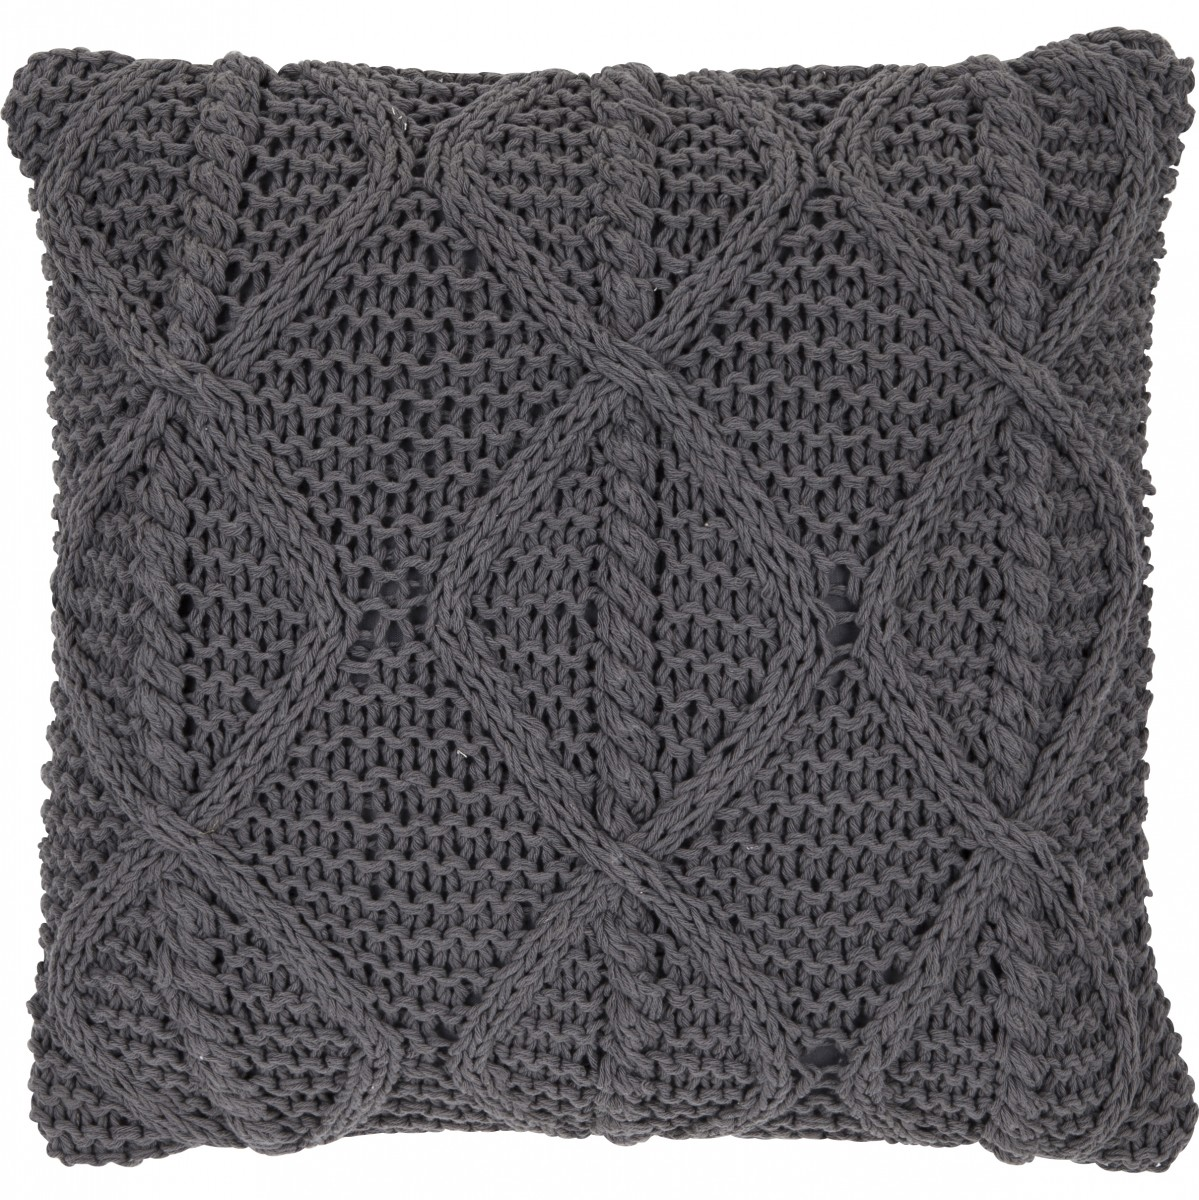 kissen deko milan strick dunkelgrau 45x45cm wohntextilien. Black Bedroom Furniture Sets. Home Design Ideas